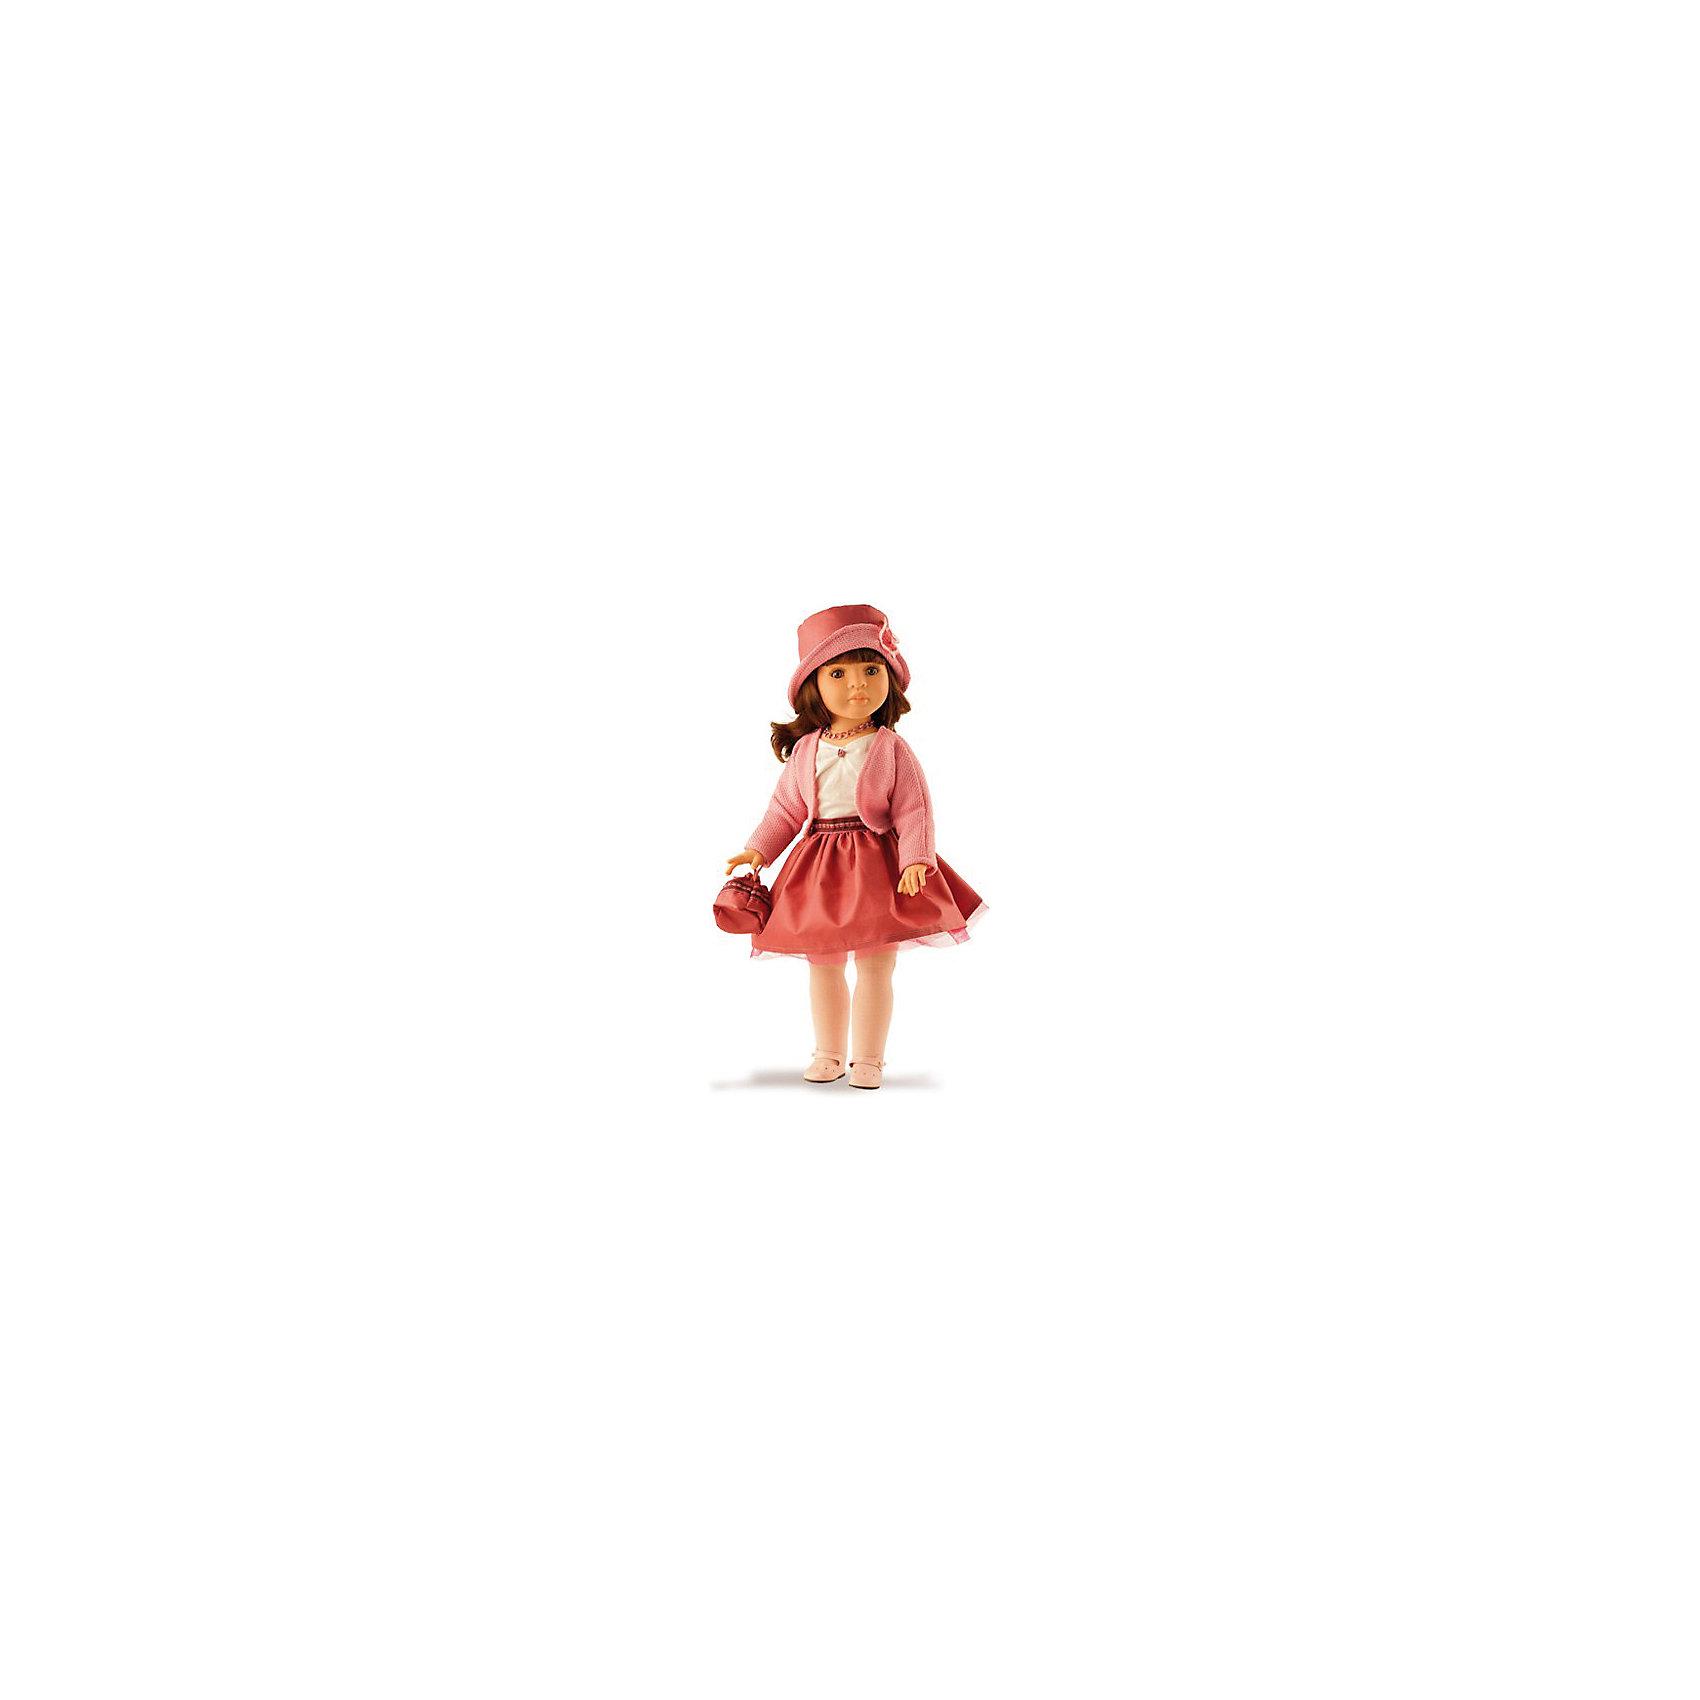 Paola Reina Кукла Лидия, 60 см, Paola Reina paola reina горди без одежды 34 см 34021